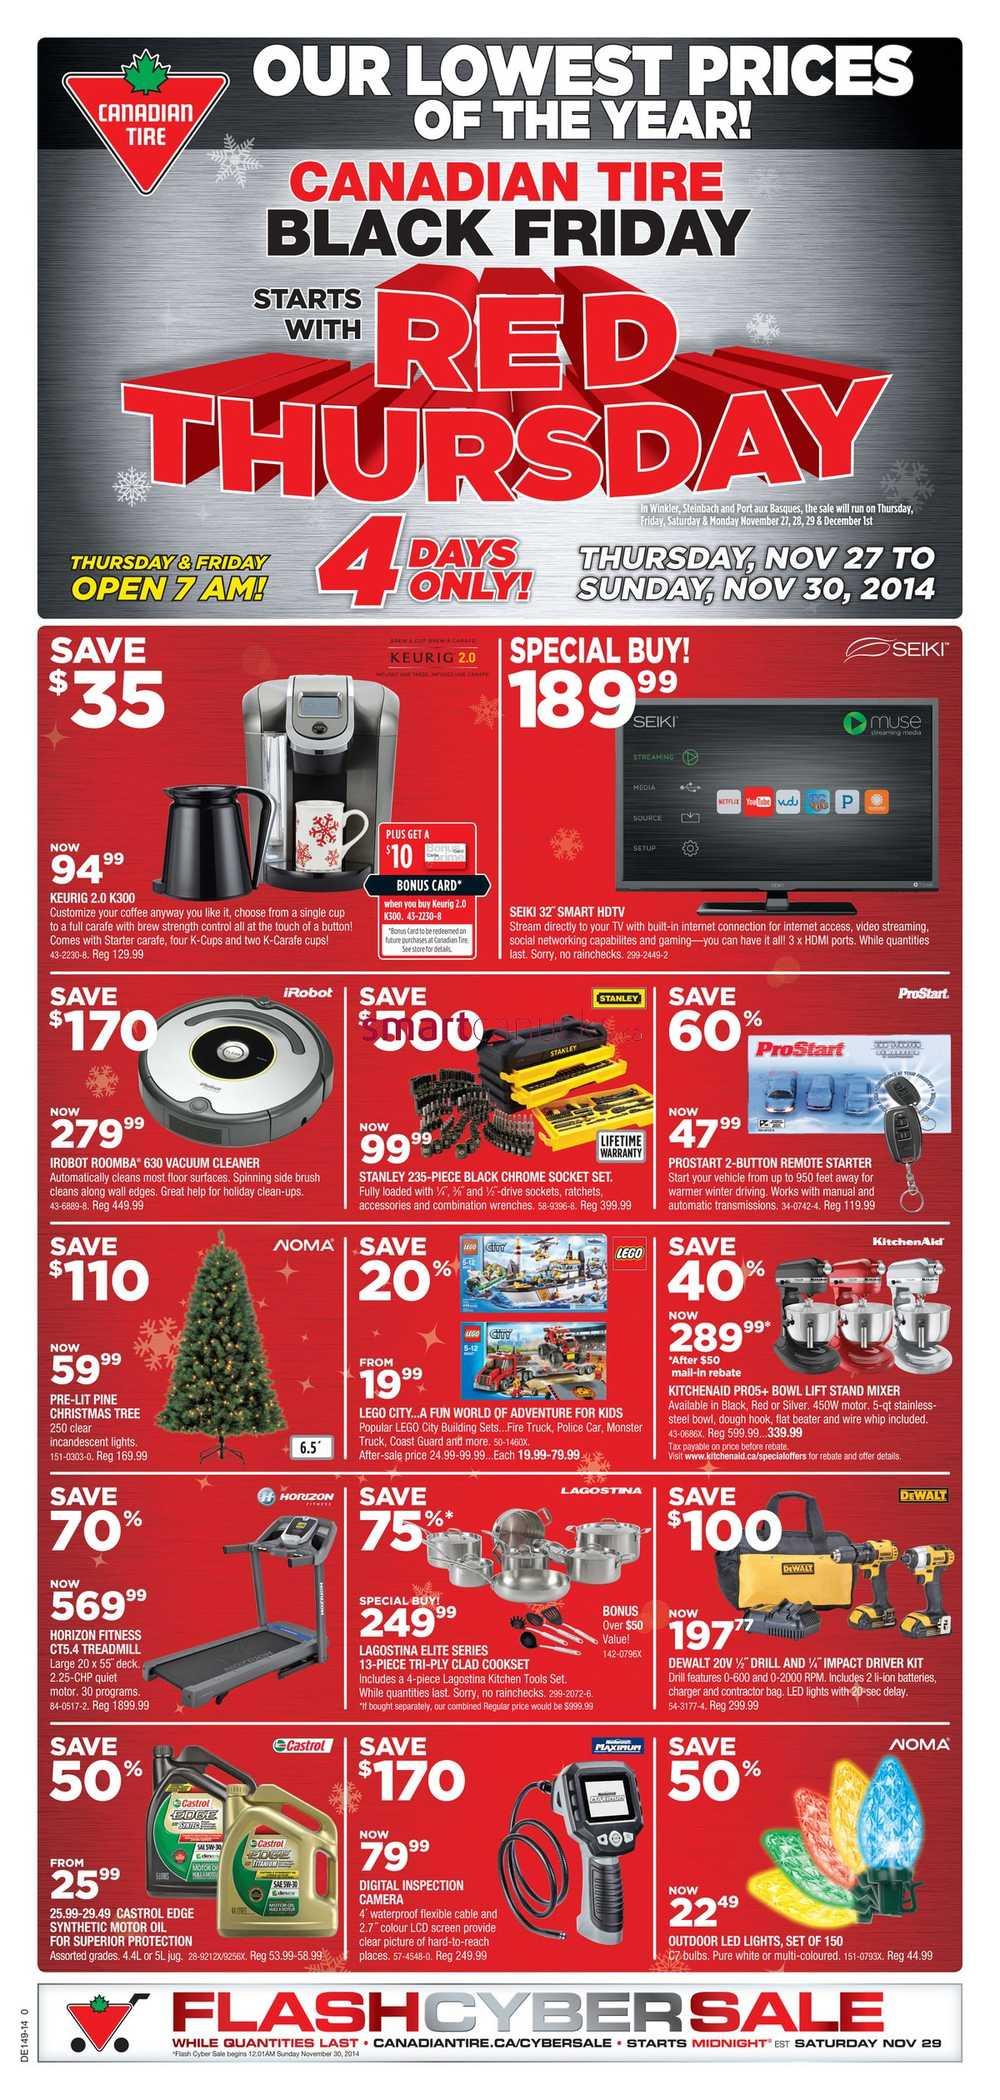 Canadian Tire Black Friday Flyer 2014 Deals Amp Sales